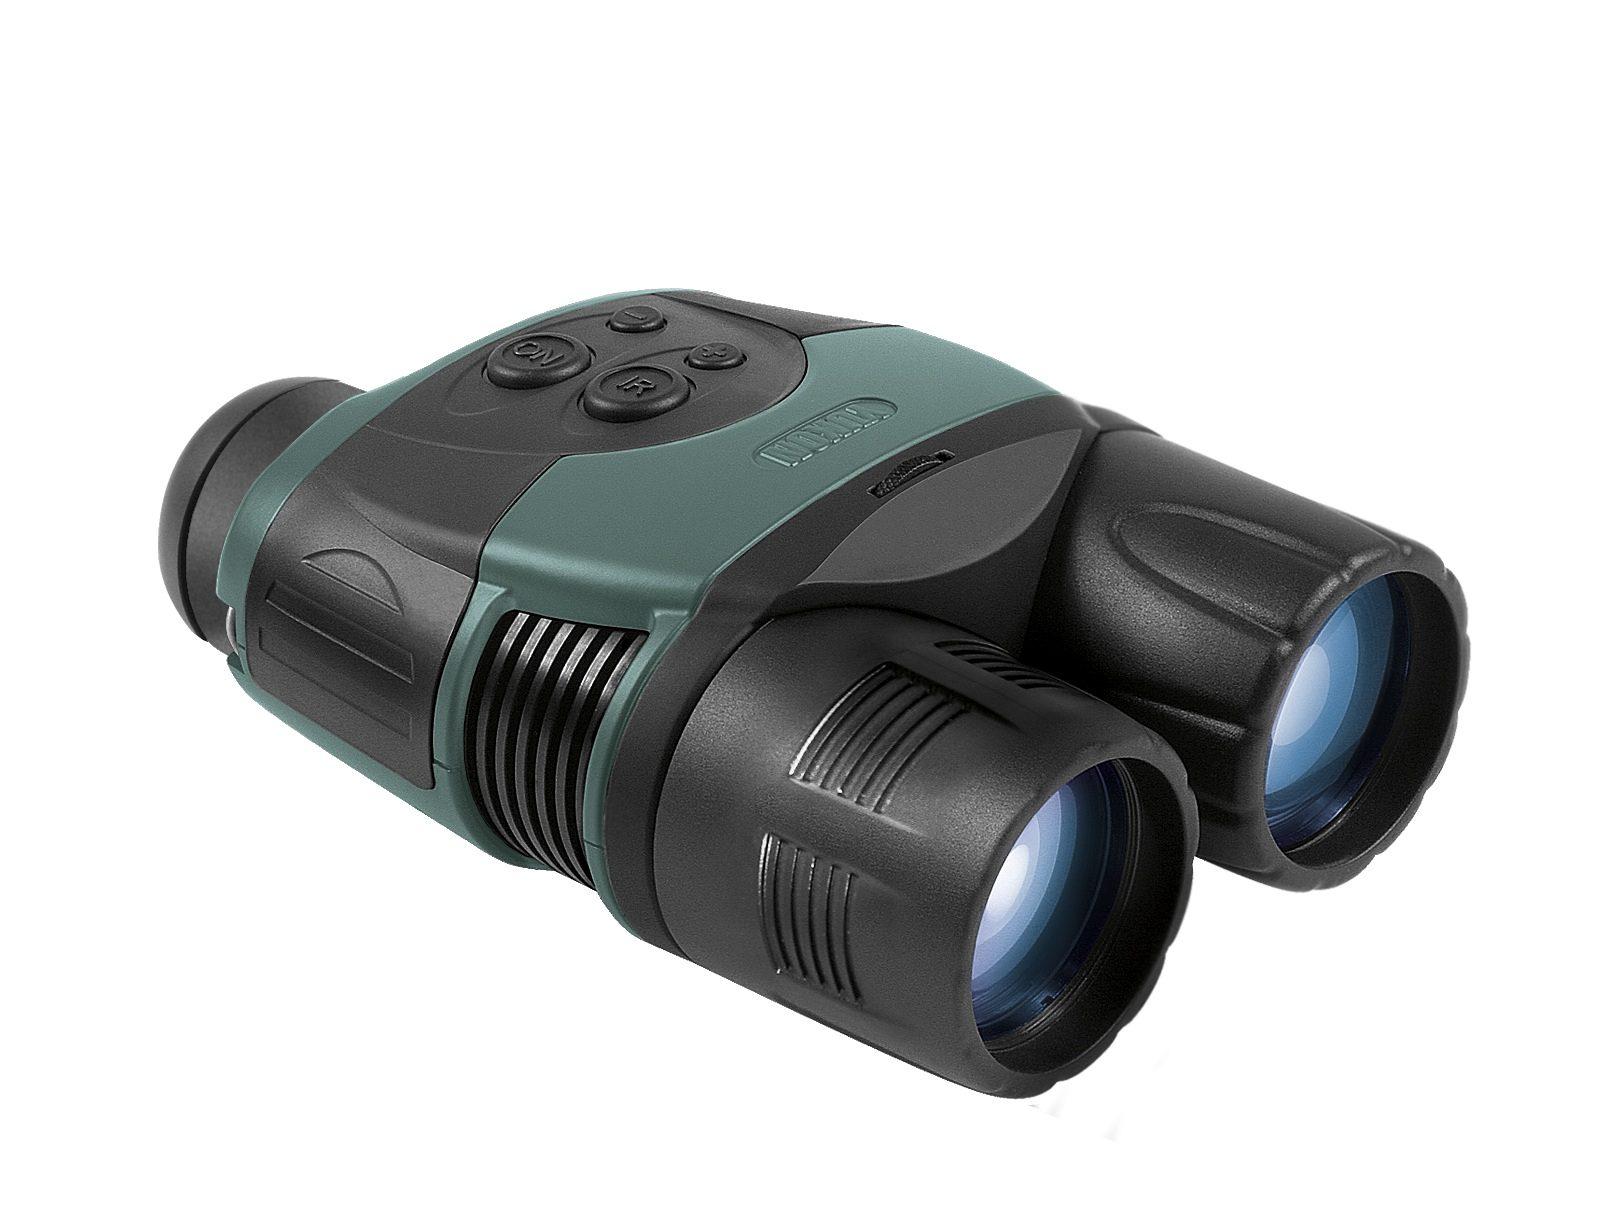 BRESSER Nachtsichtgerät »YUKON Ranger LT 6.5x42 Digitales Nachtsichtgerät«